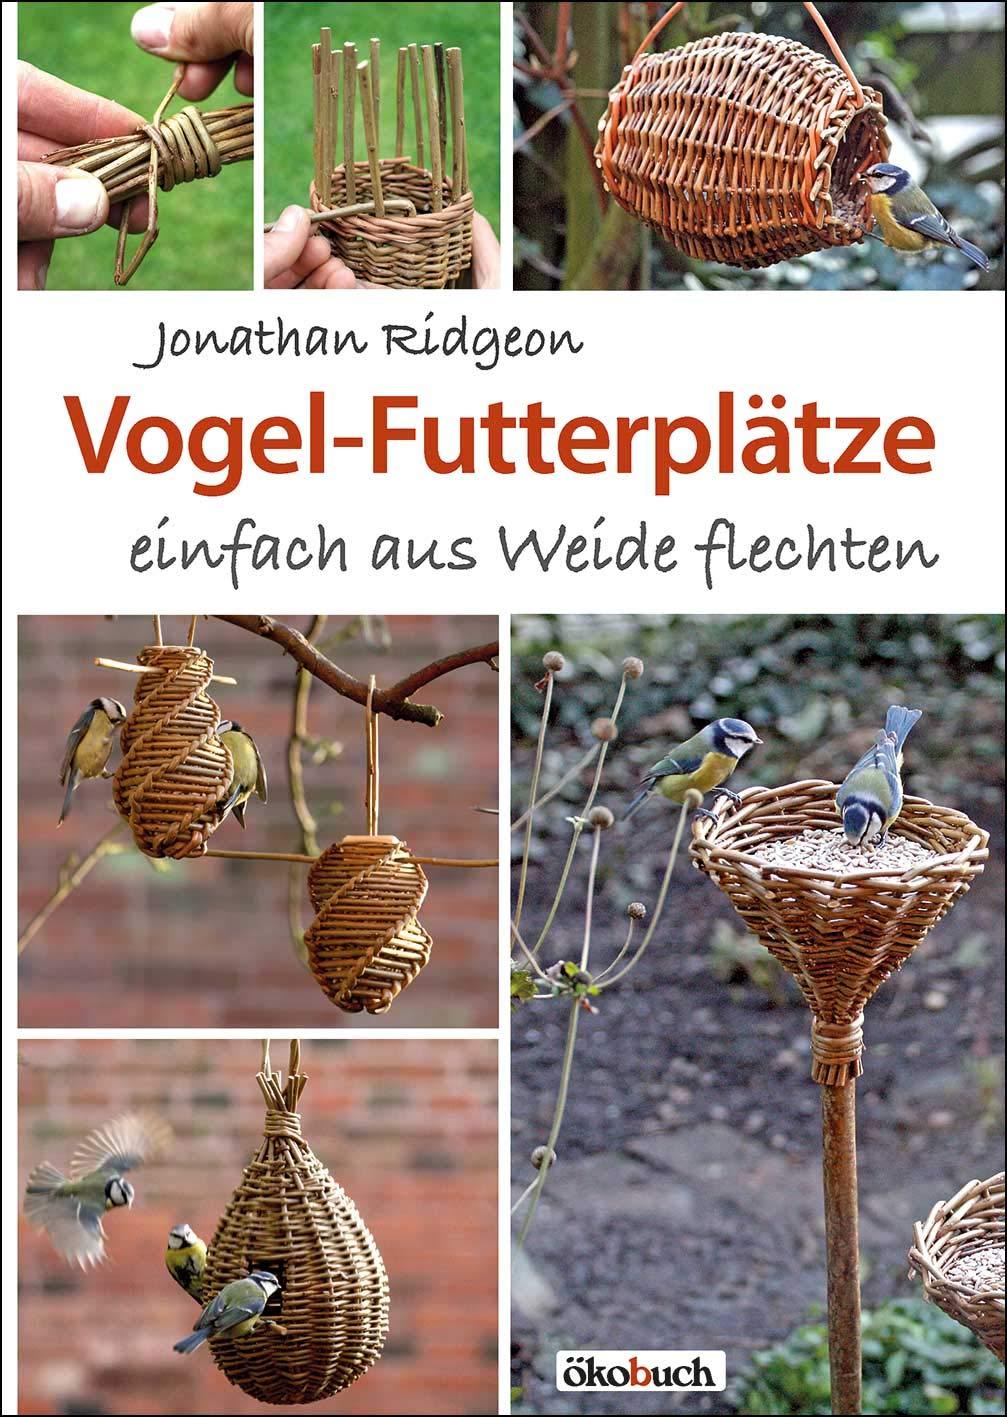 Vogel-Futterplätze: einfach aus Weide flechten: Ridgeon, Jonathan